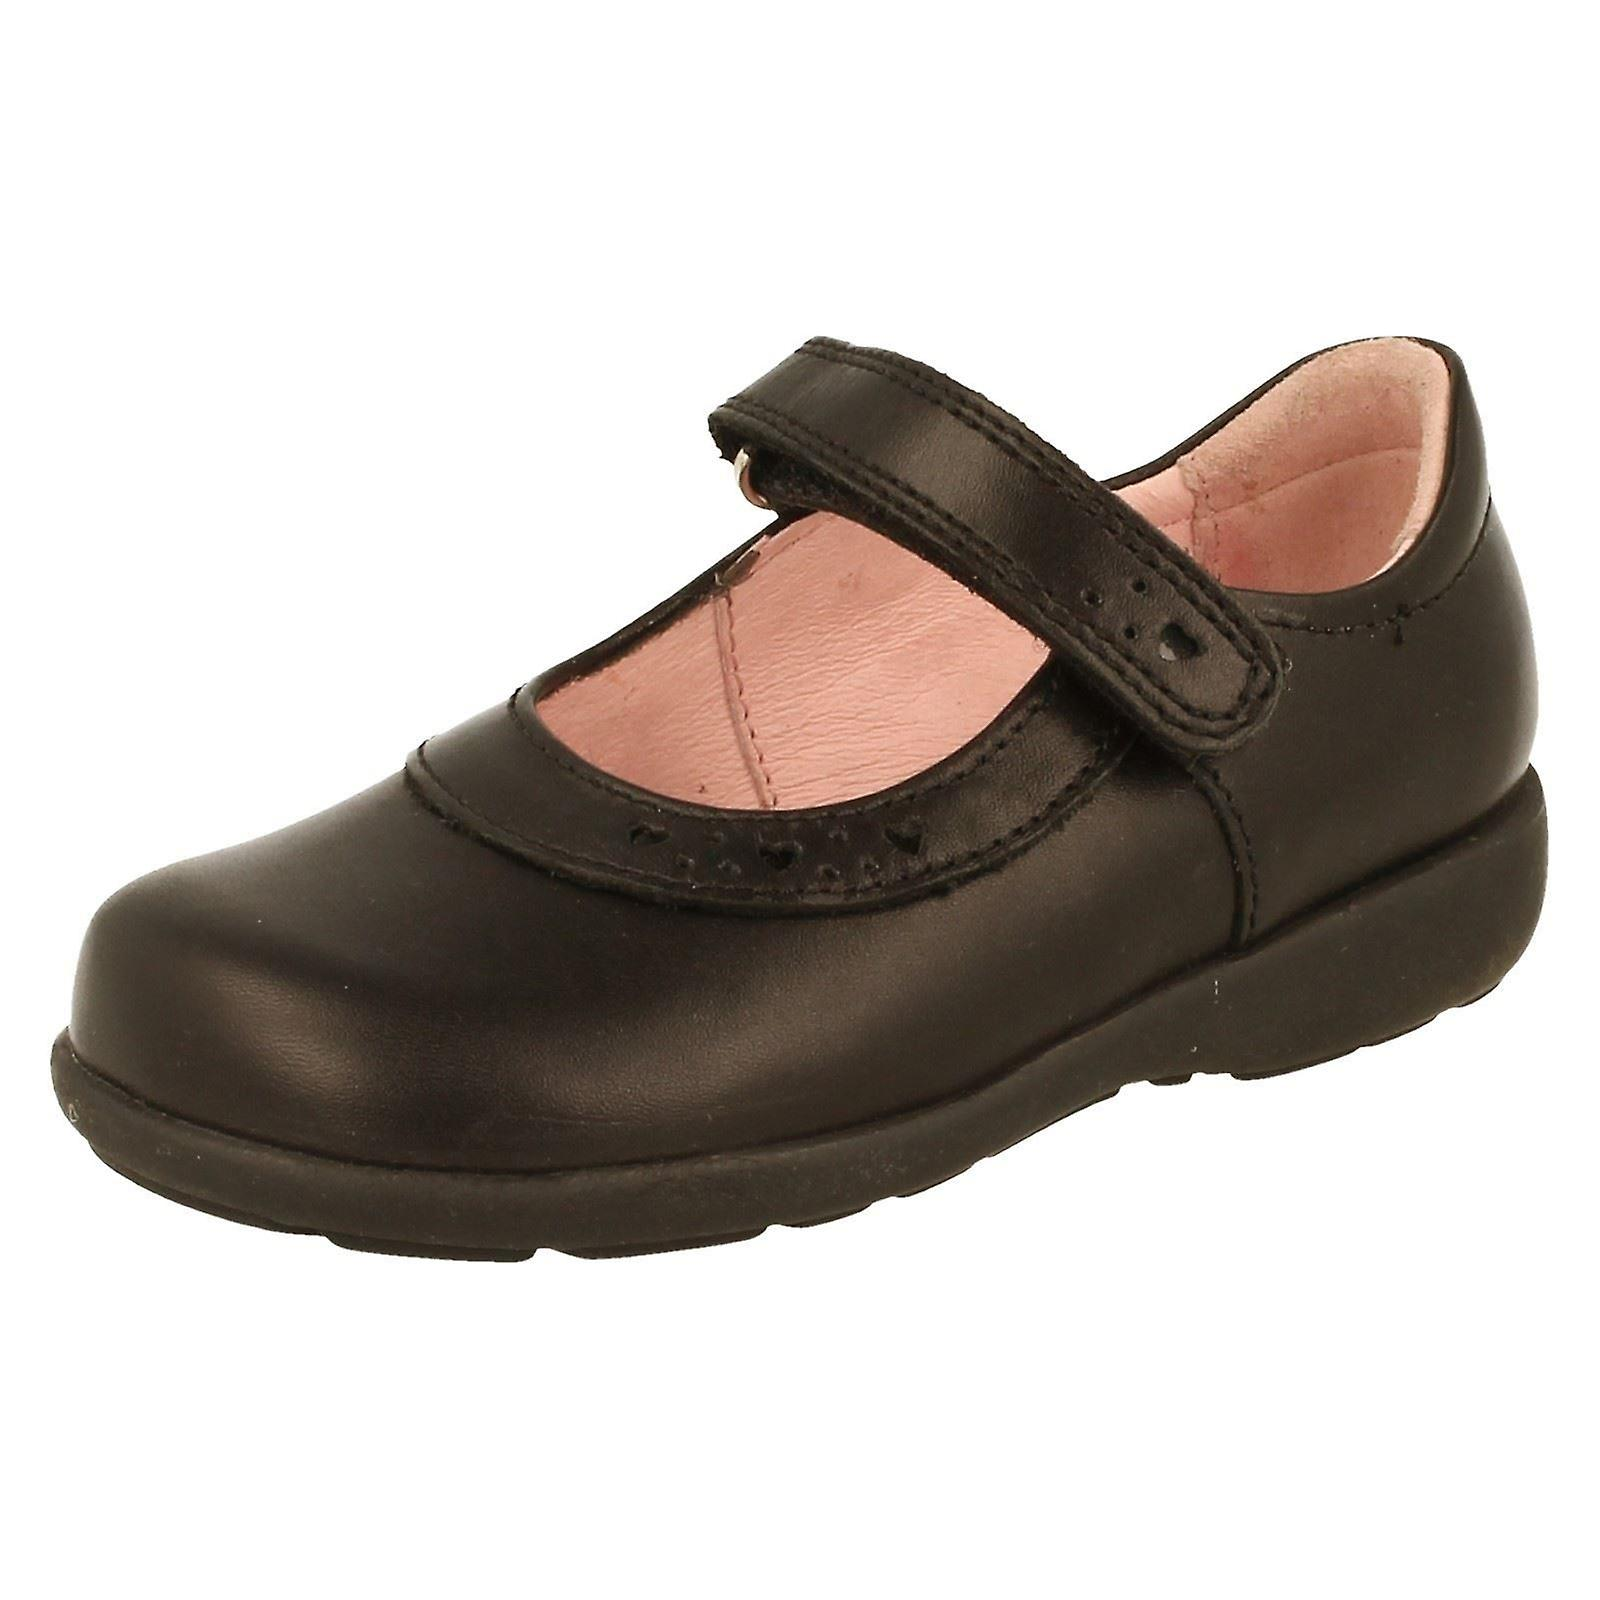 Girls Pre-Trilogy Start Rite Formal/School Shoes Pre-Trilogy Girls 537ac9